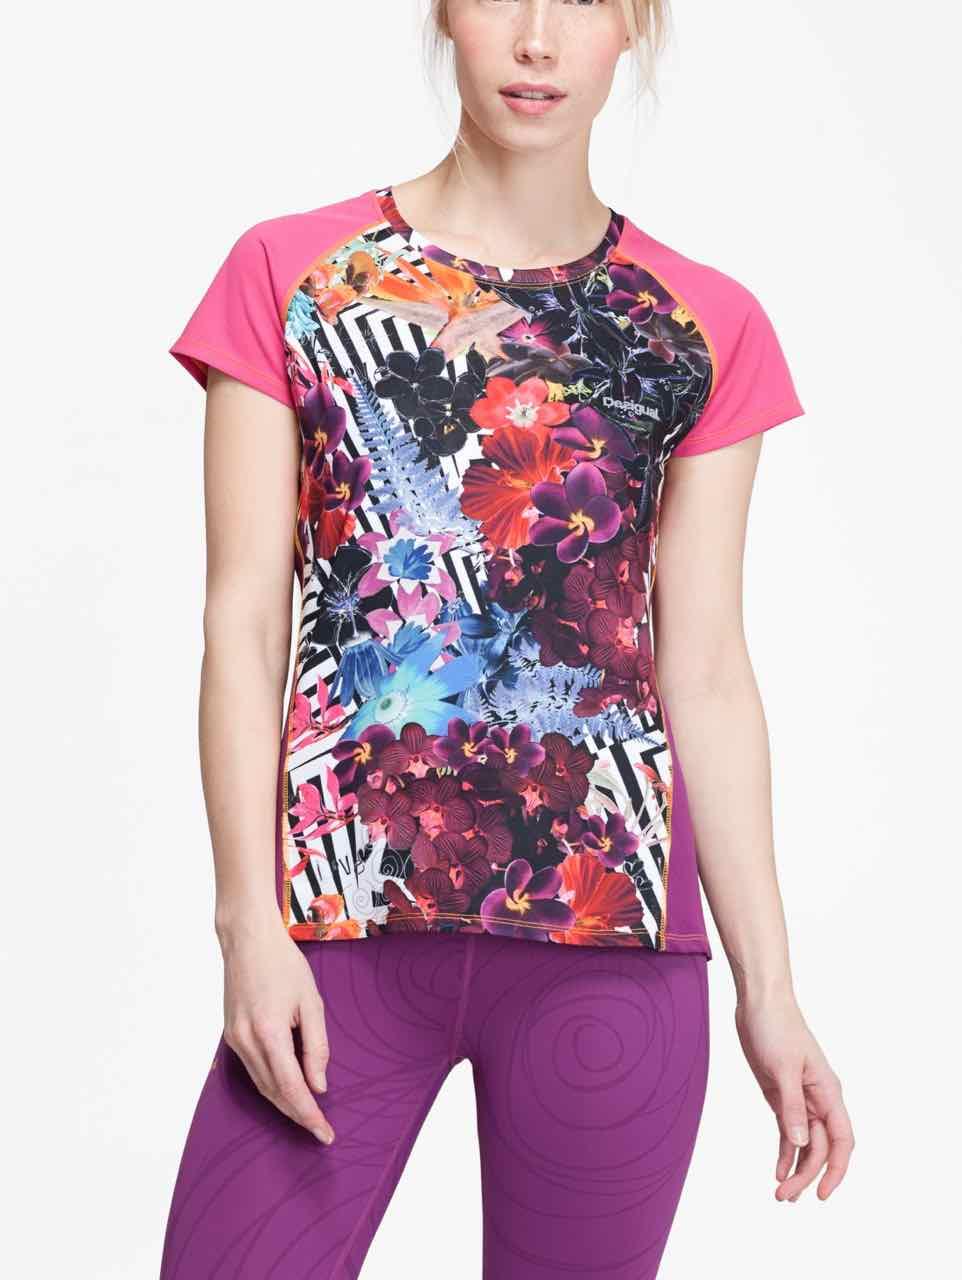 67T2SA0_3125 Desigual Sport T-Shirt A-T-S Short Sleeve